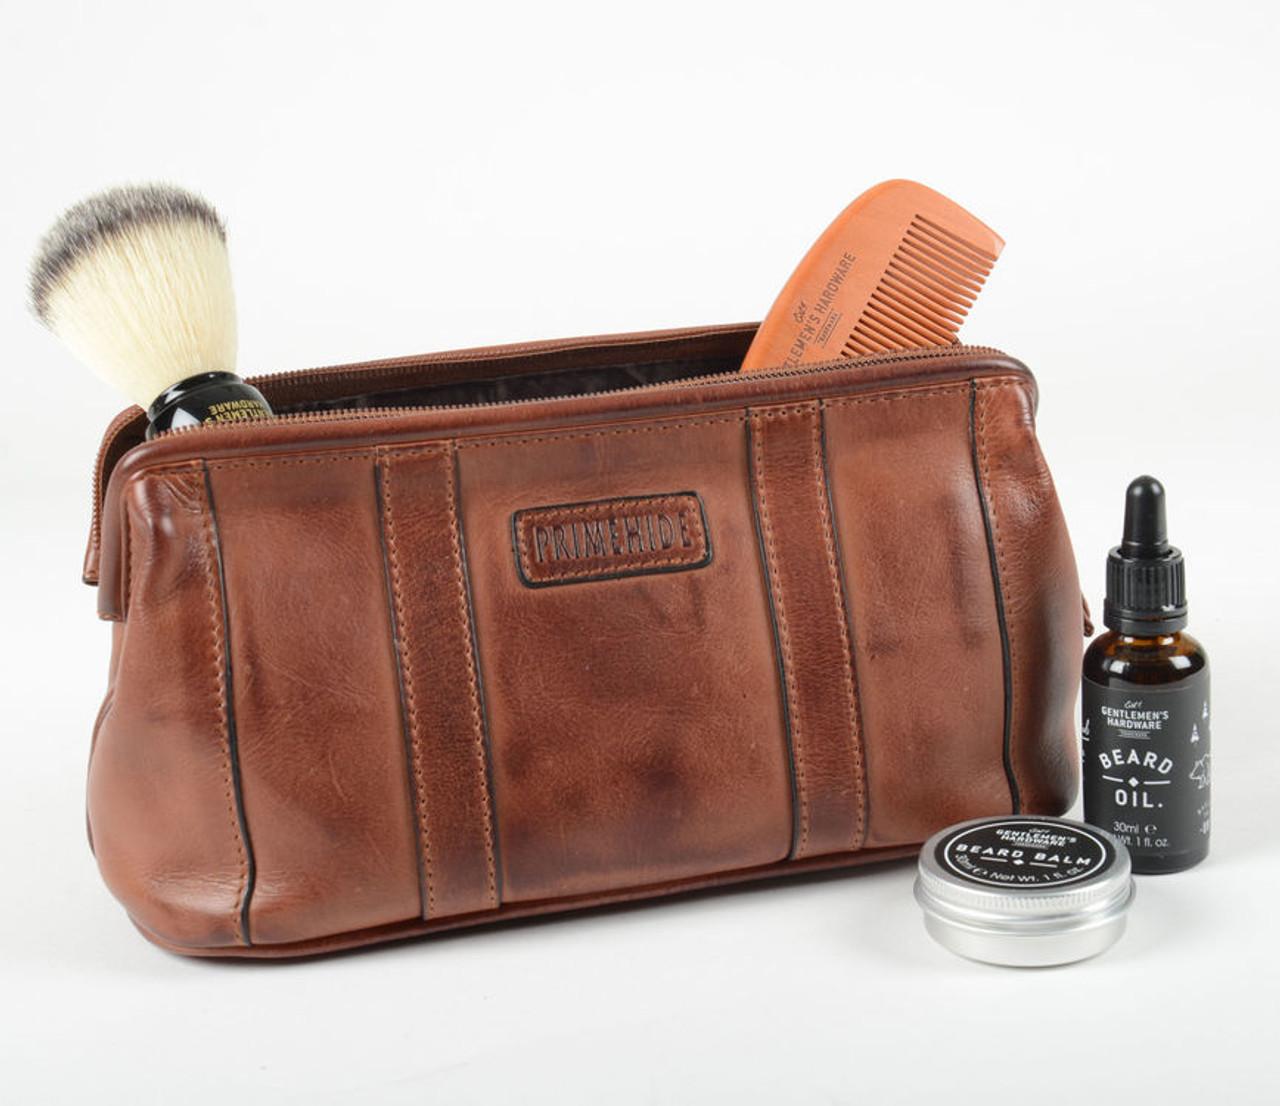 Prime Hide Ridgeback Brown Leather Toiletry Wash Bag 14bf93247a052